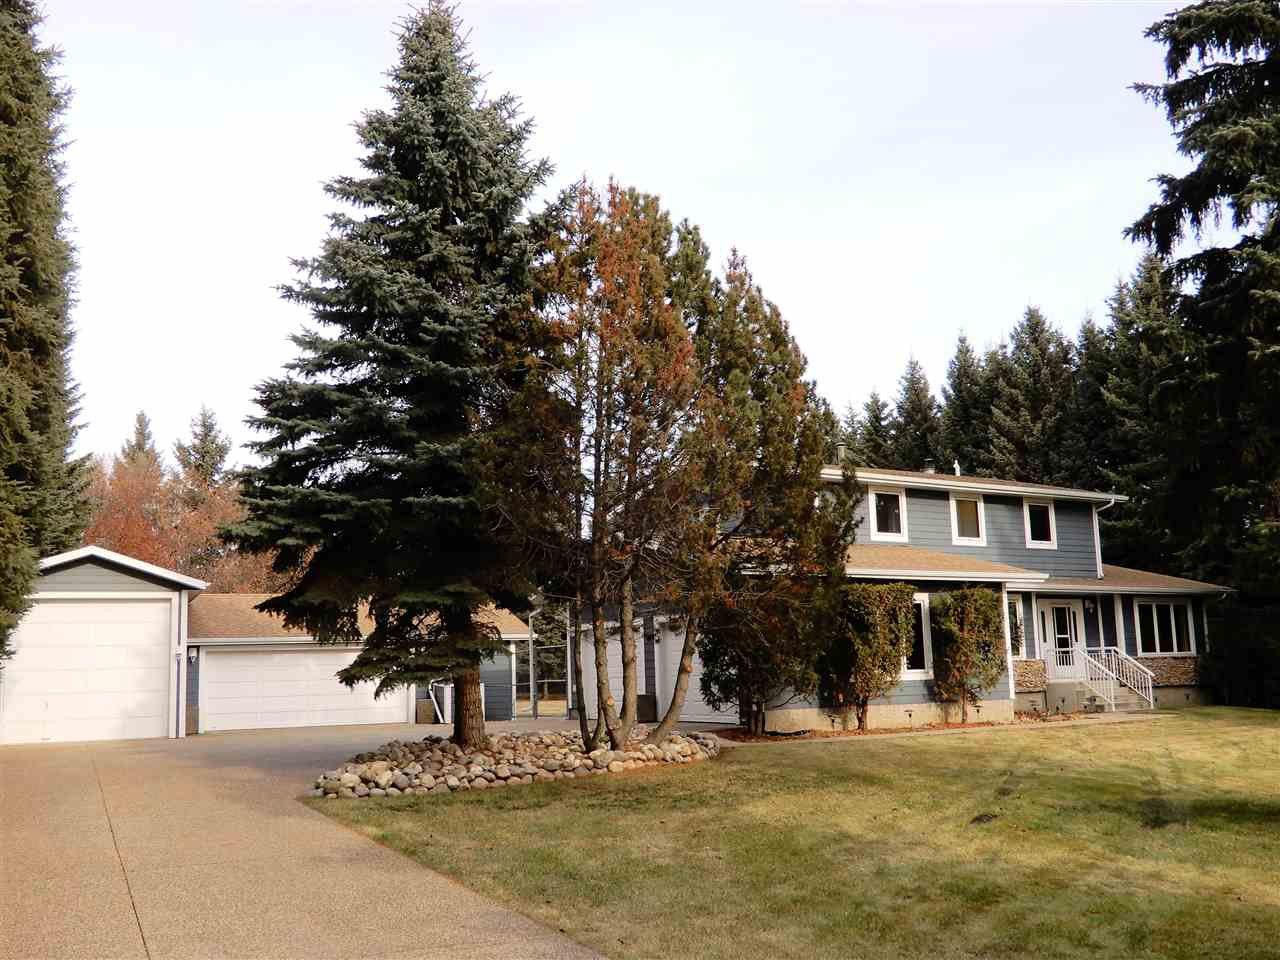 Main Photo: 136 FERNWOOD Crescent: Rural Sturgeon County House for sale : MLS®# E4179153